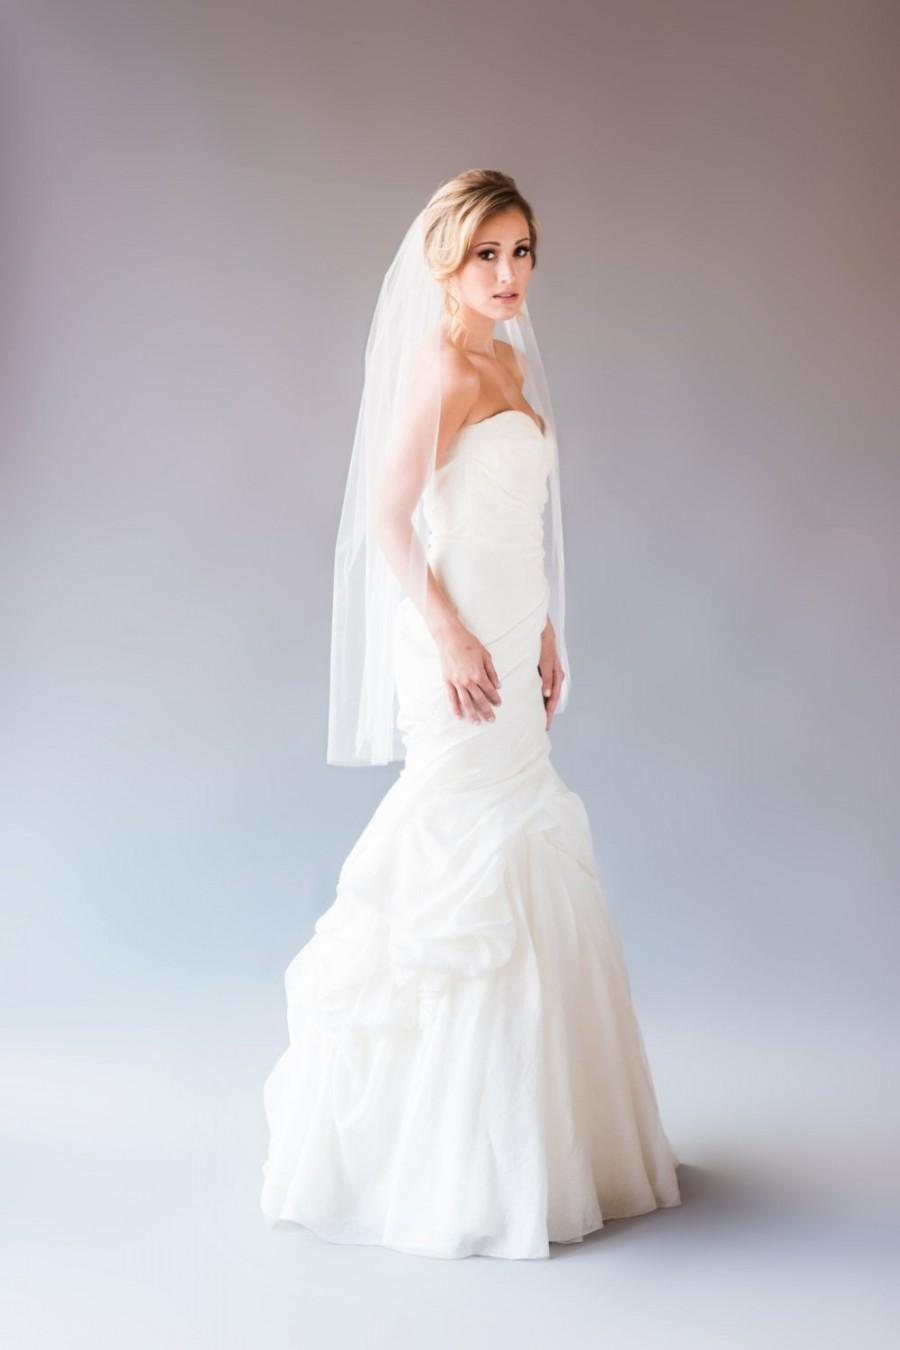 Mariage - Alexis Veil - Crystal Rhinestone Detail on Fingertip Length Wedding Veil, 3mm Clear Rhinestone, Bridal Veil, Short Veil, Single Tier Veil